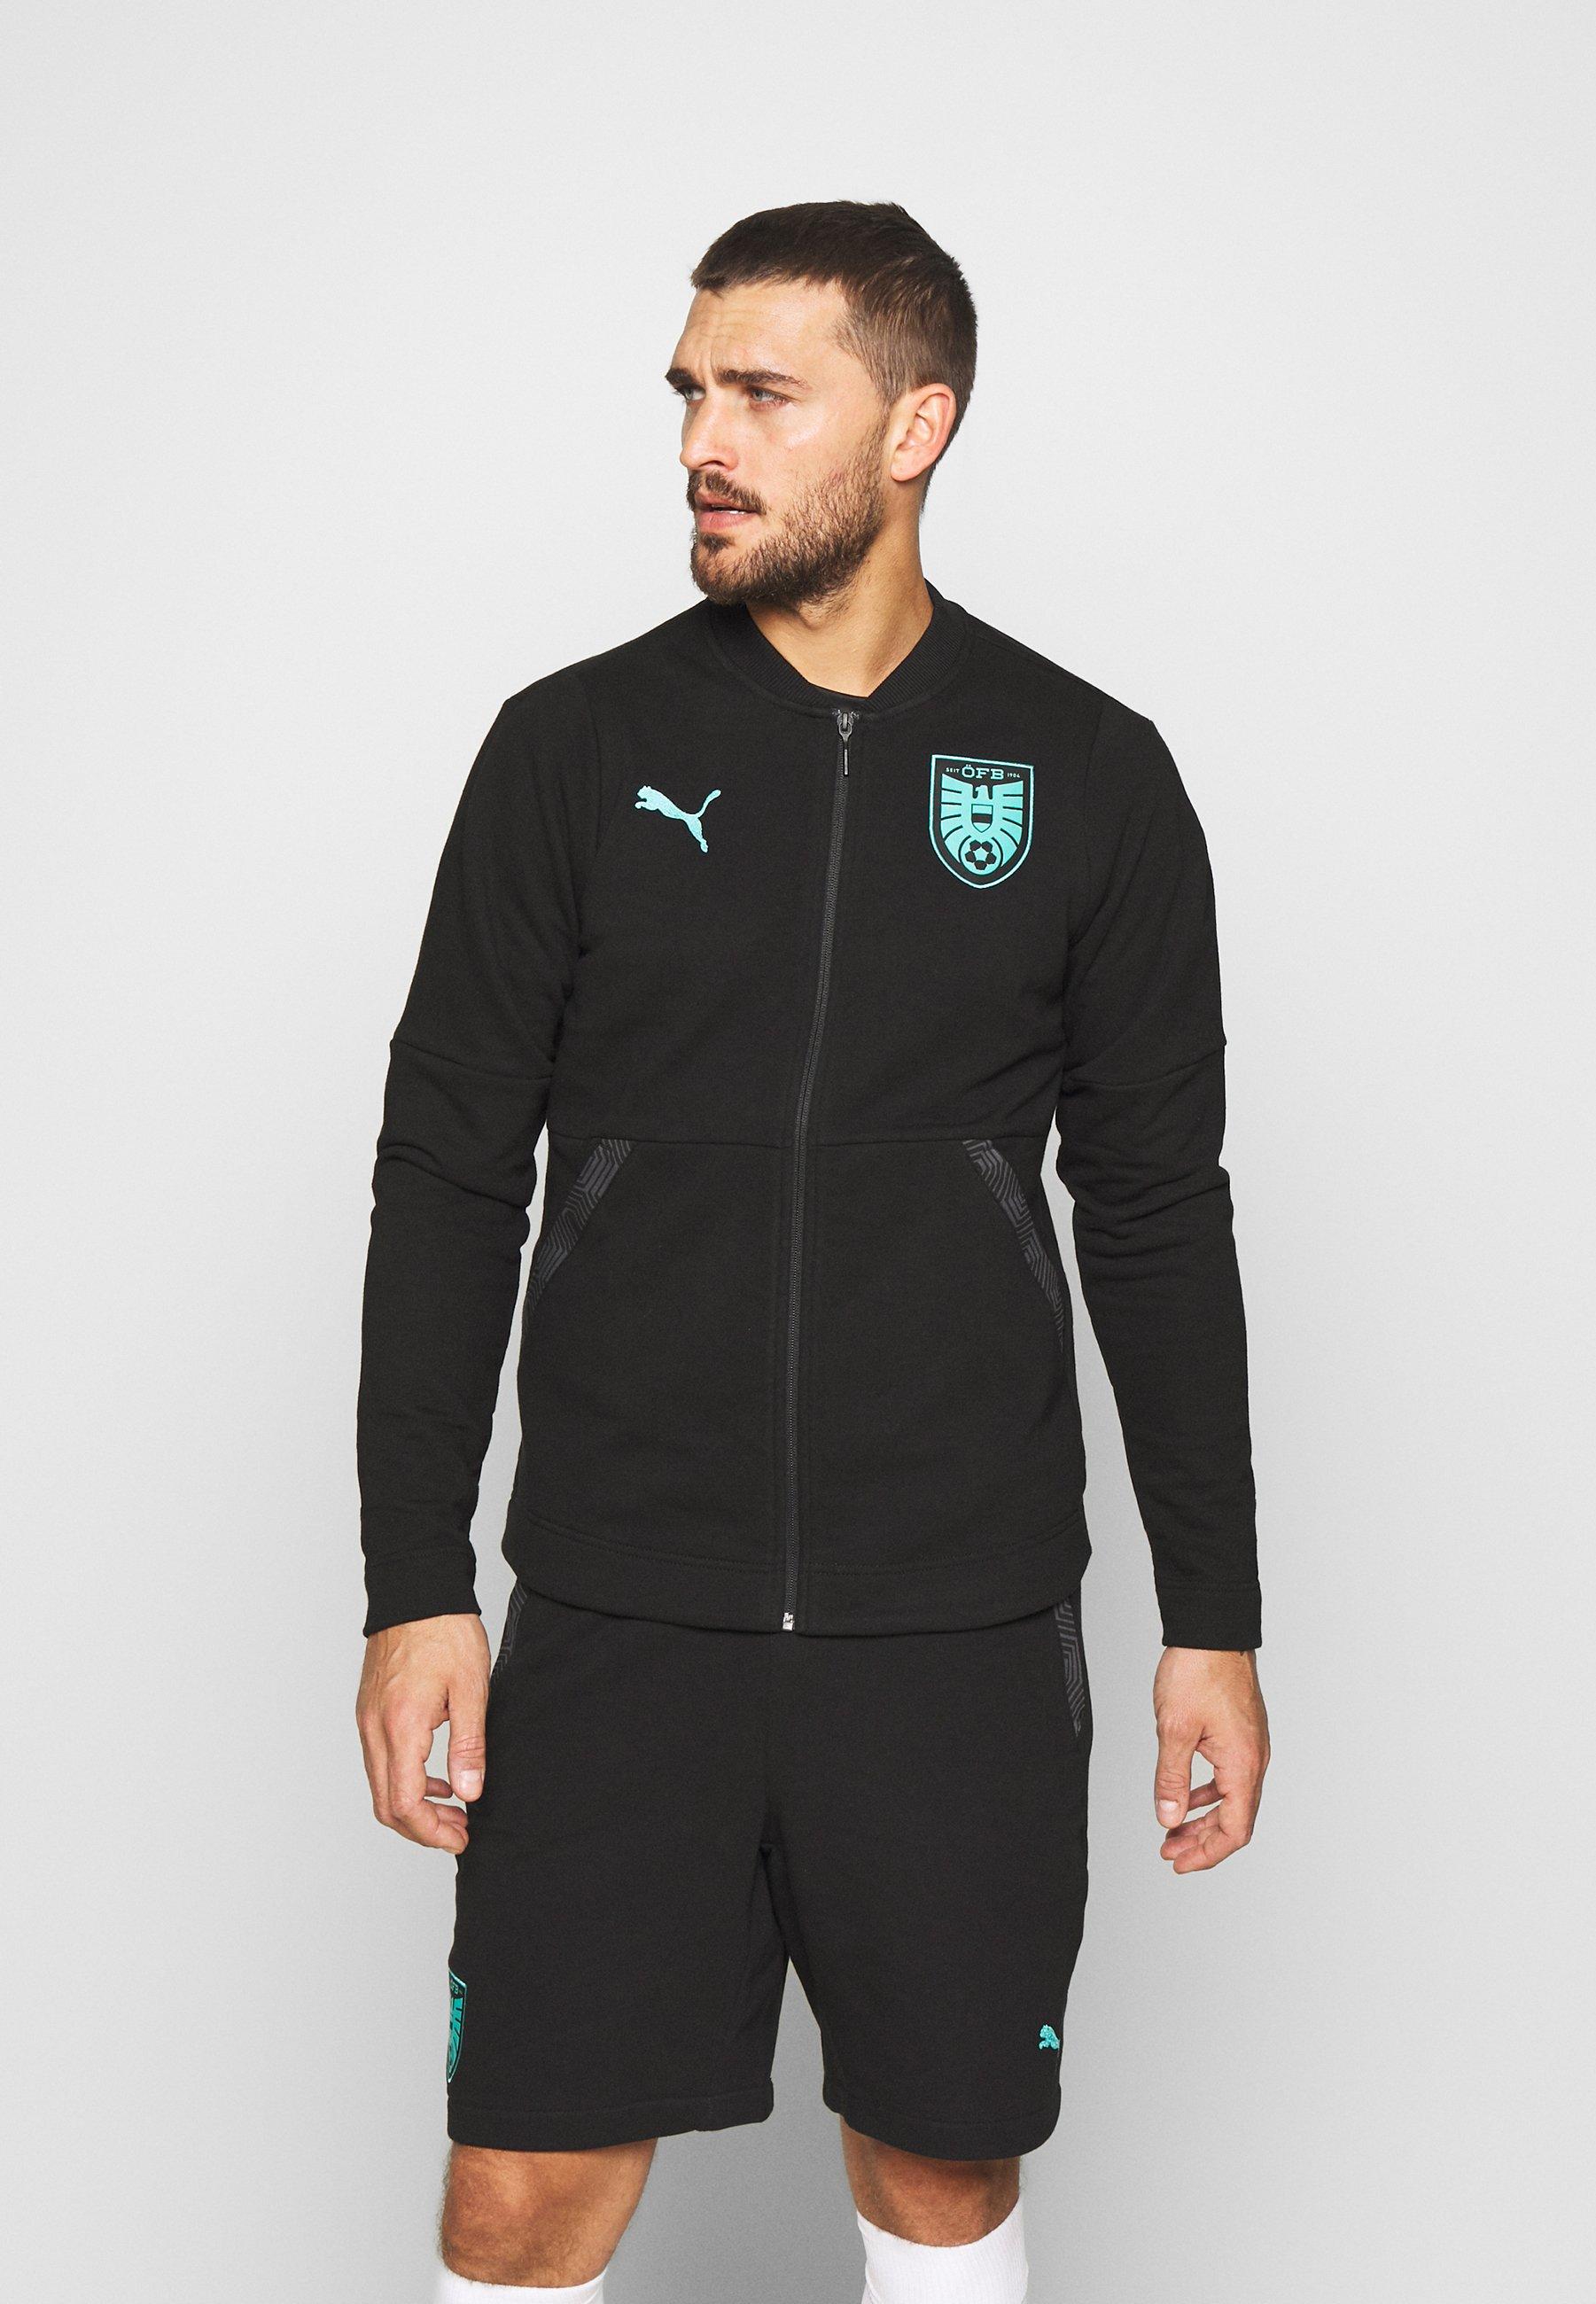 Men ÖSTERREICH ÖFB CASUALS JACKET - Training jacket